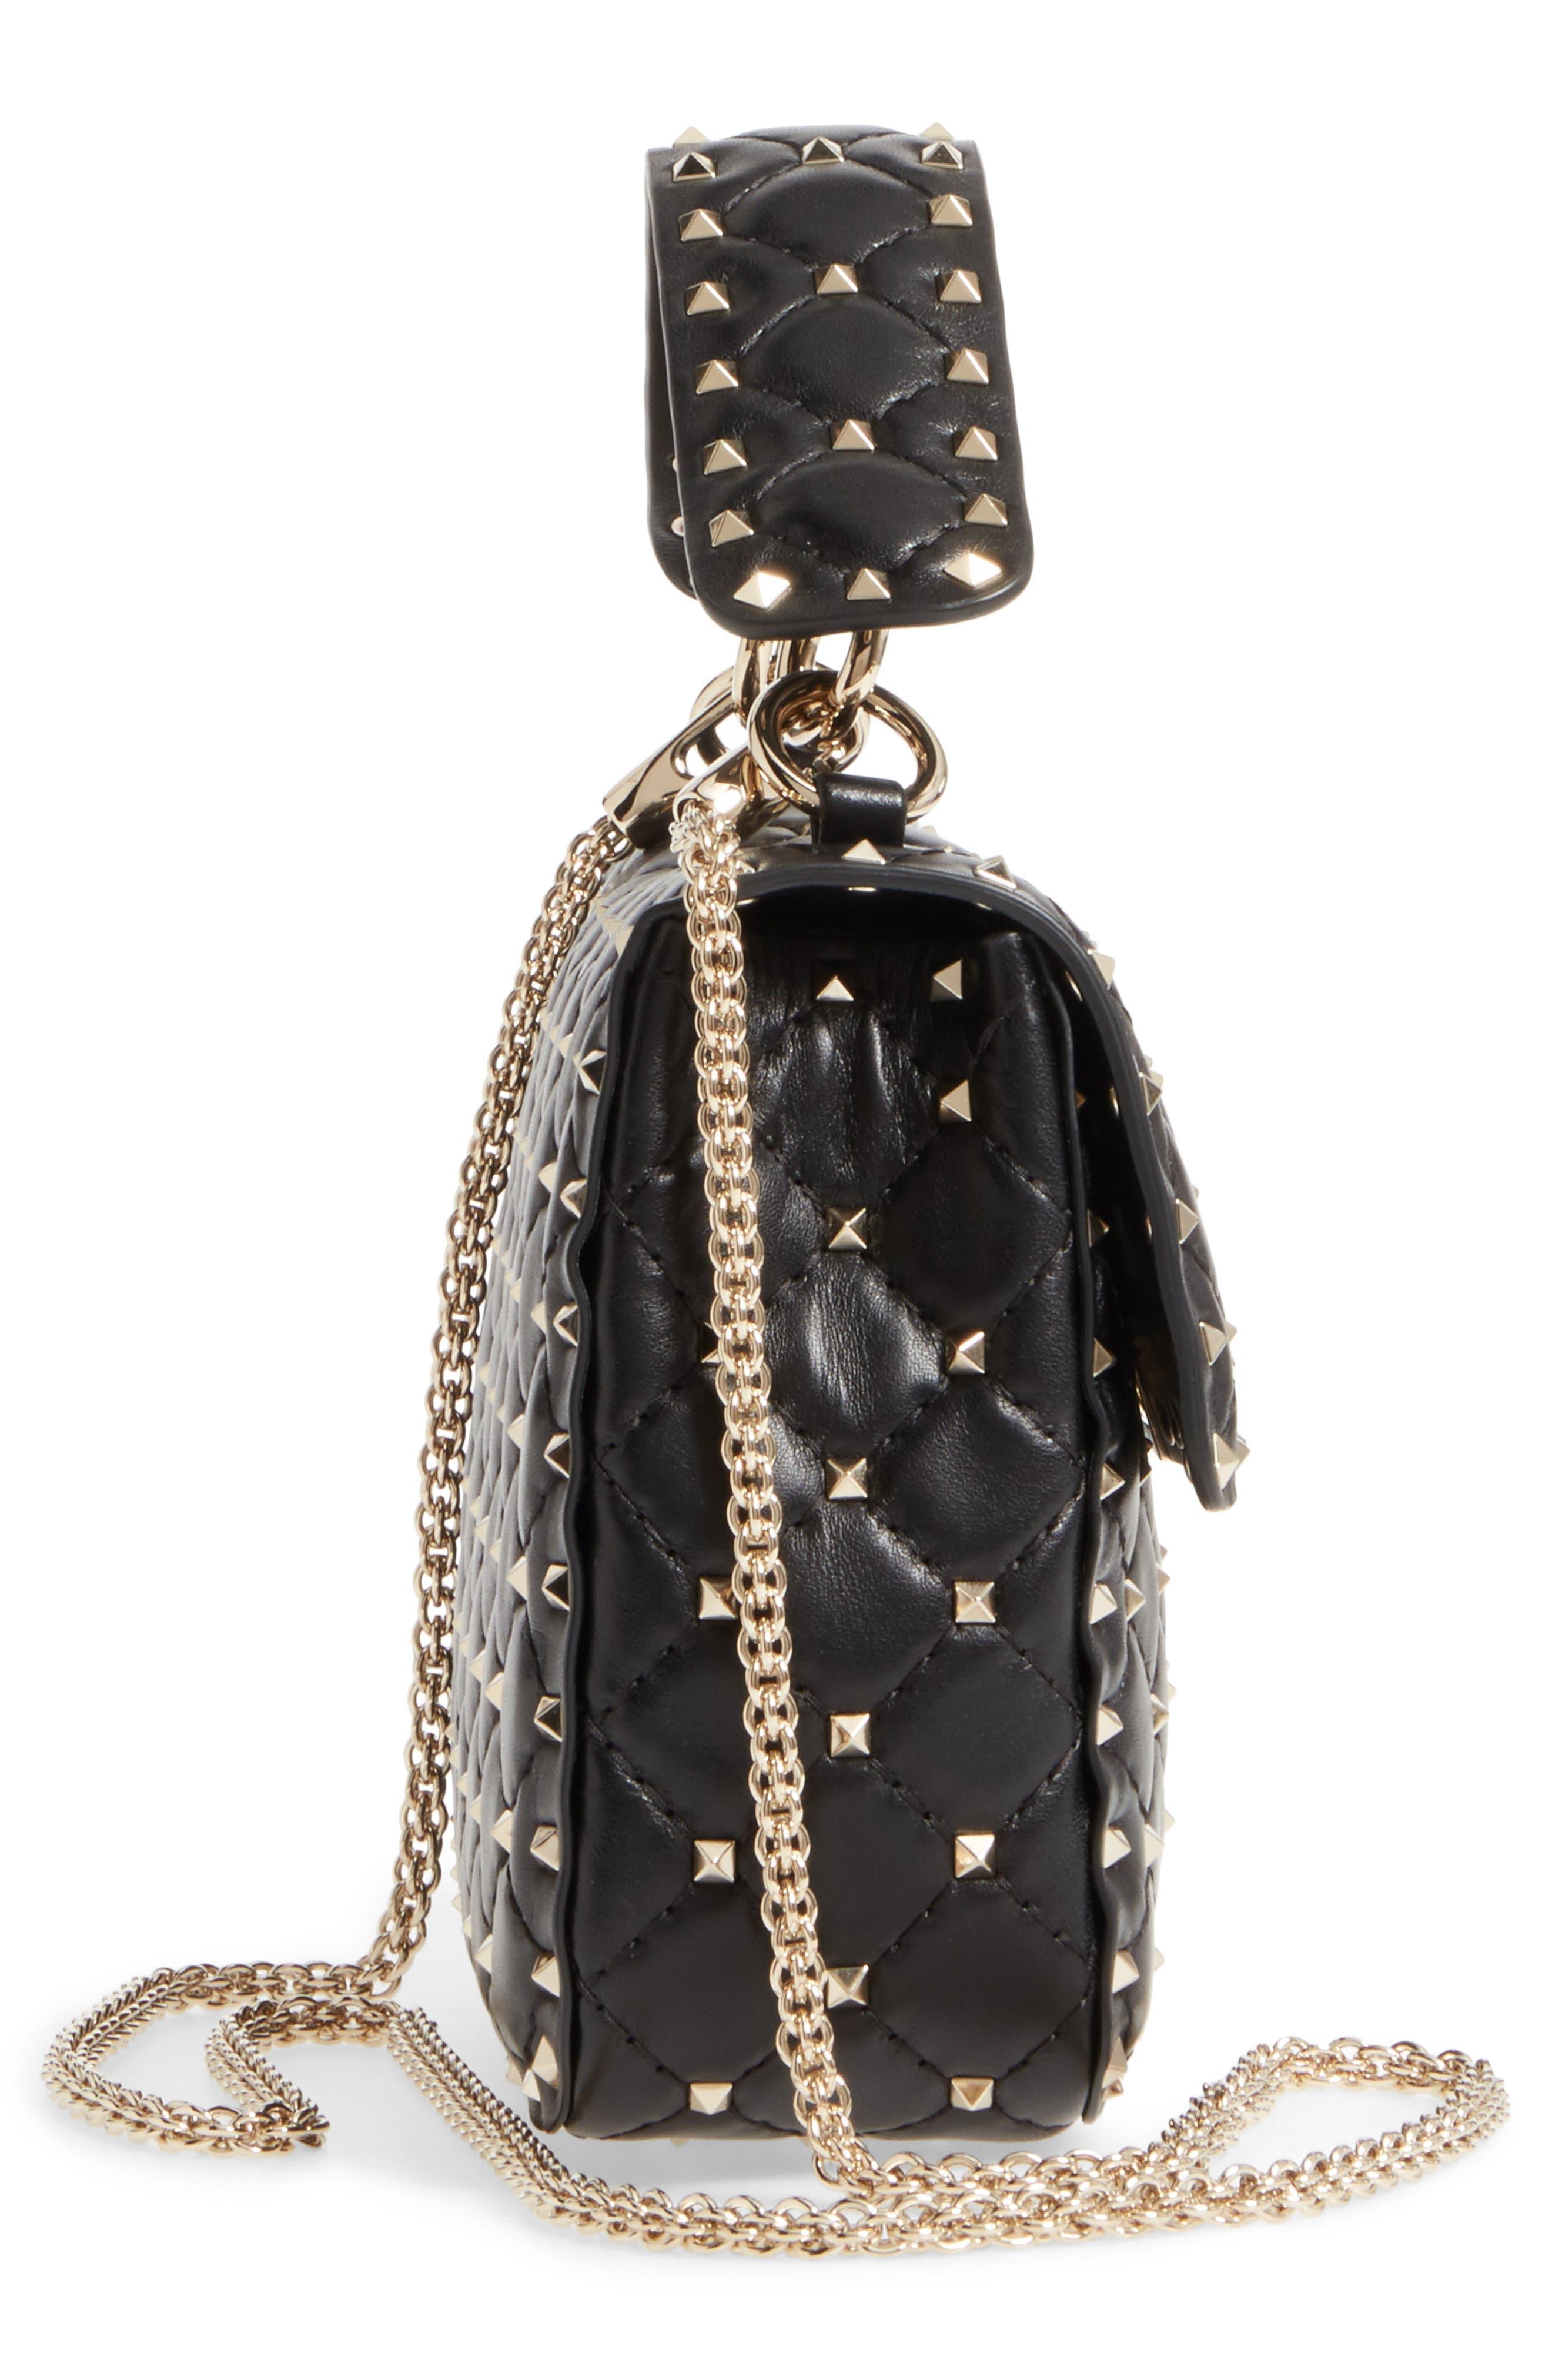 Medium Rockstud Matelassé Quilted Leather Shoulder Bag,                             Alternate thumbnail 5, color,                             BLACK